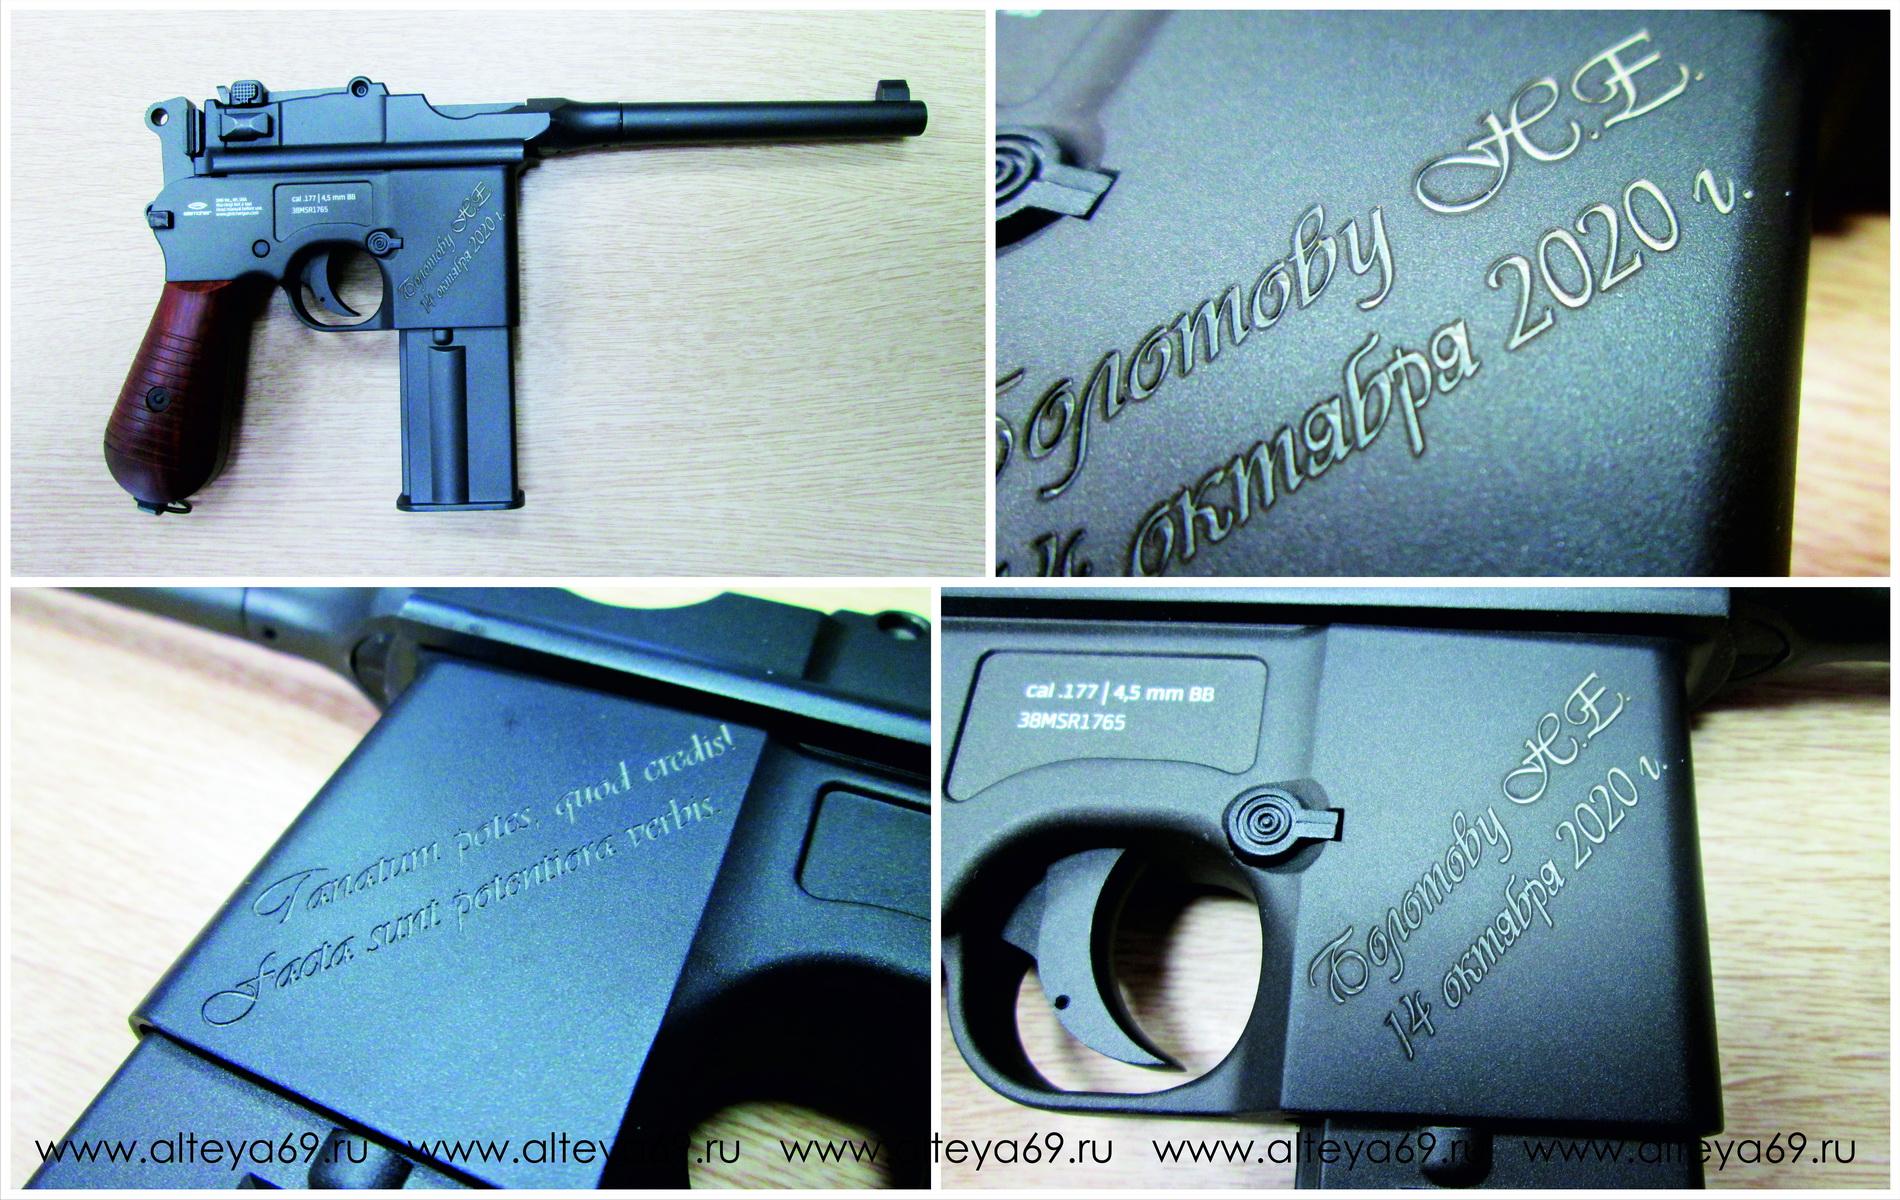 Гравировка на пневматический пистолет